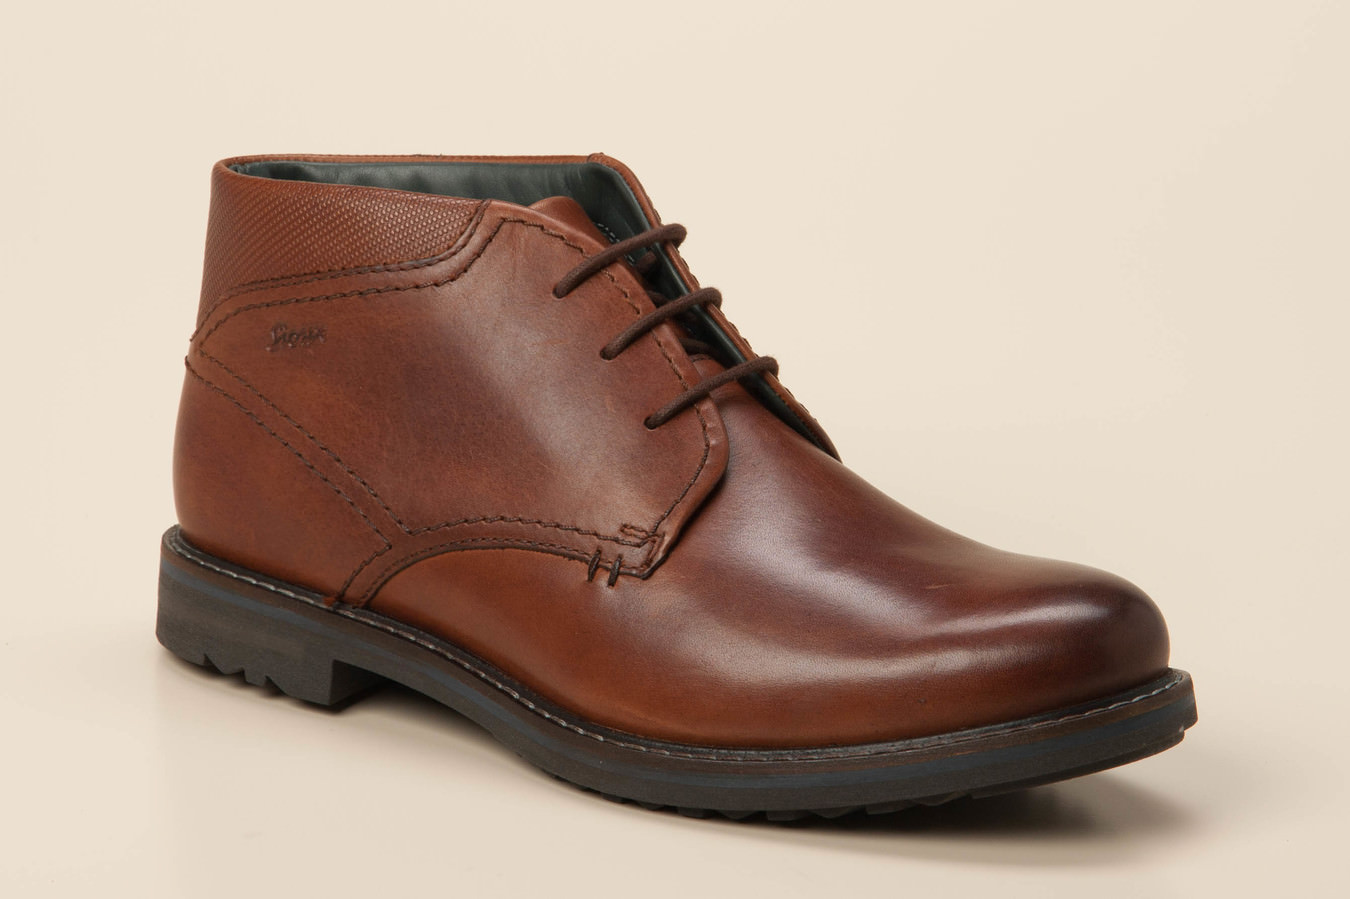 840481a8e4 Sioux Herren Boots in cognac kaufen | Zumnorde Online-Shop